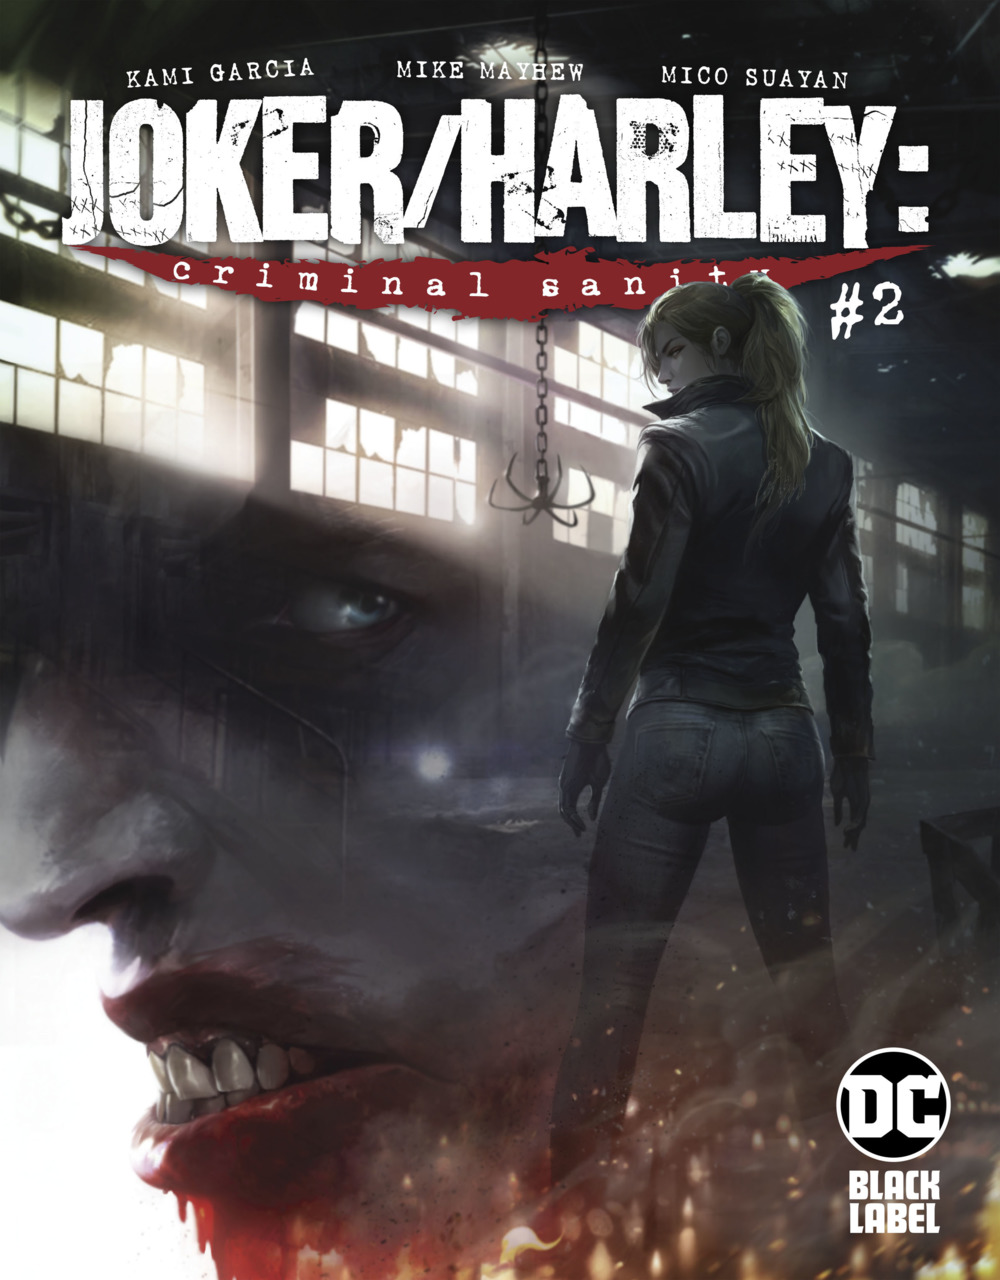 Joker/Harley: Criminal Insanity by Kami Garcia